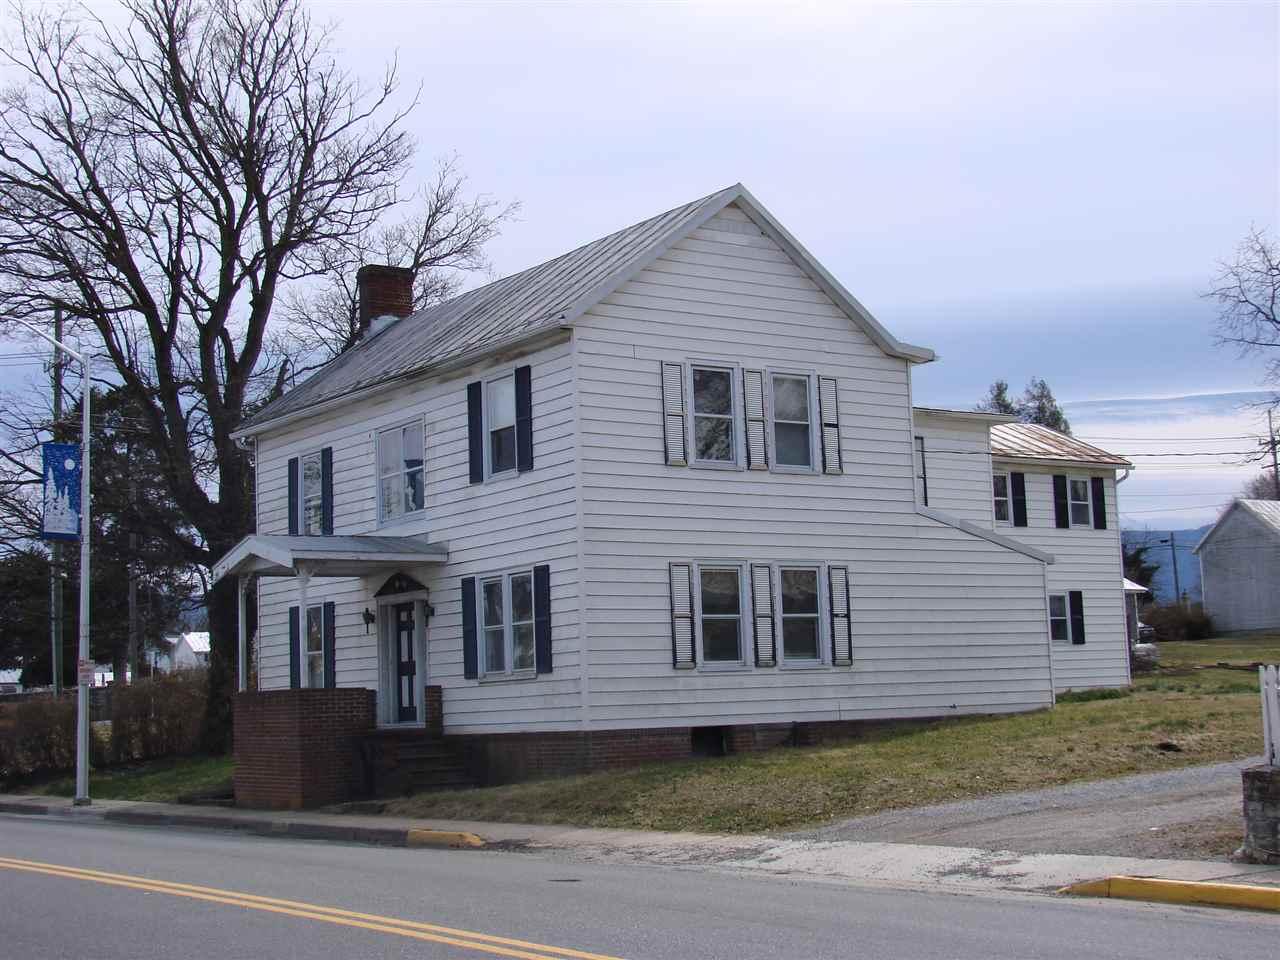 146 EAST MAIN ST, LURAY, VA 22835